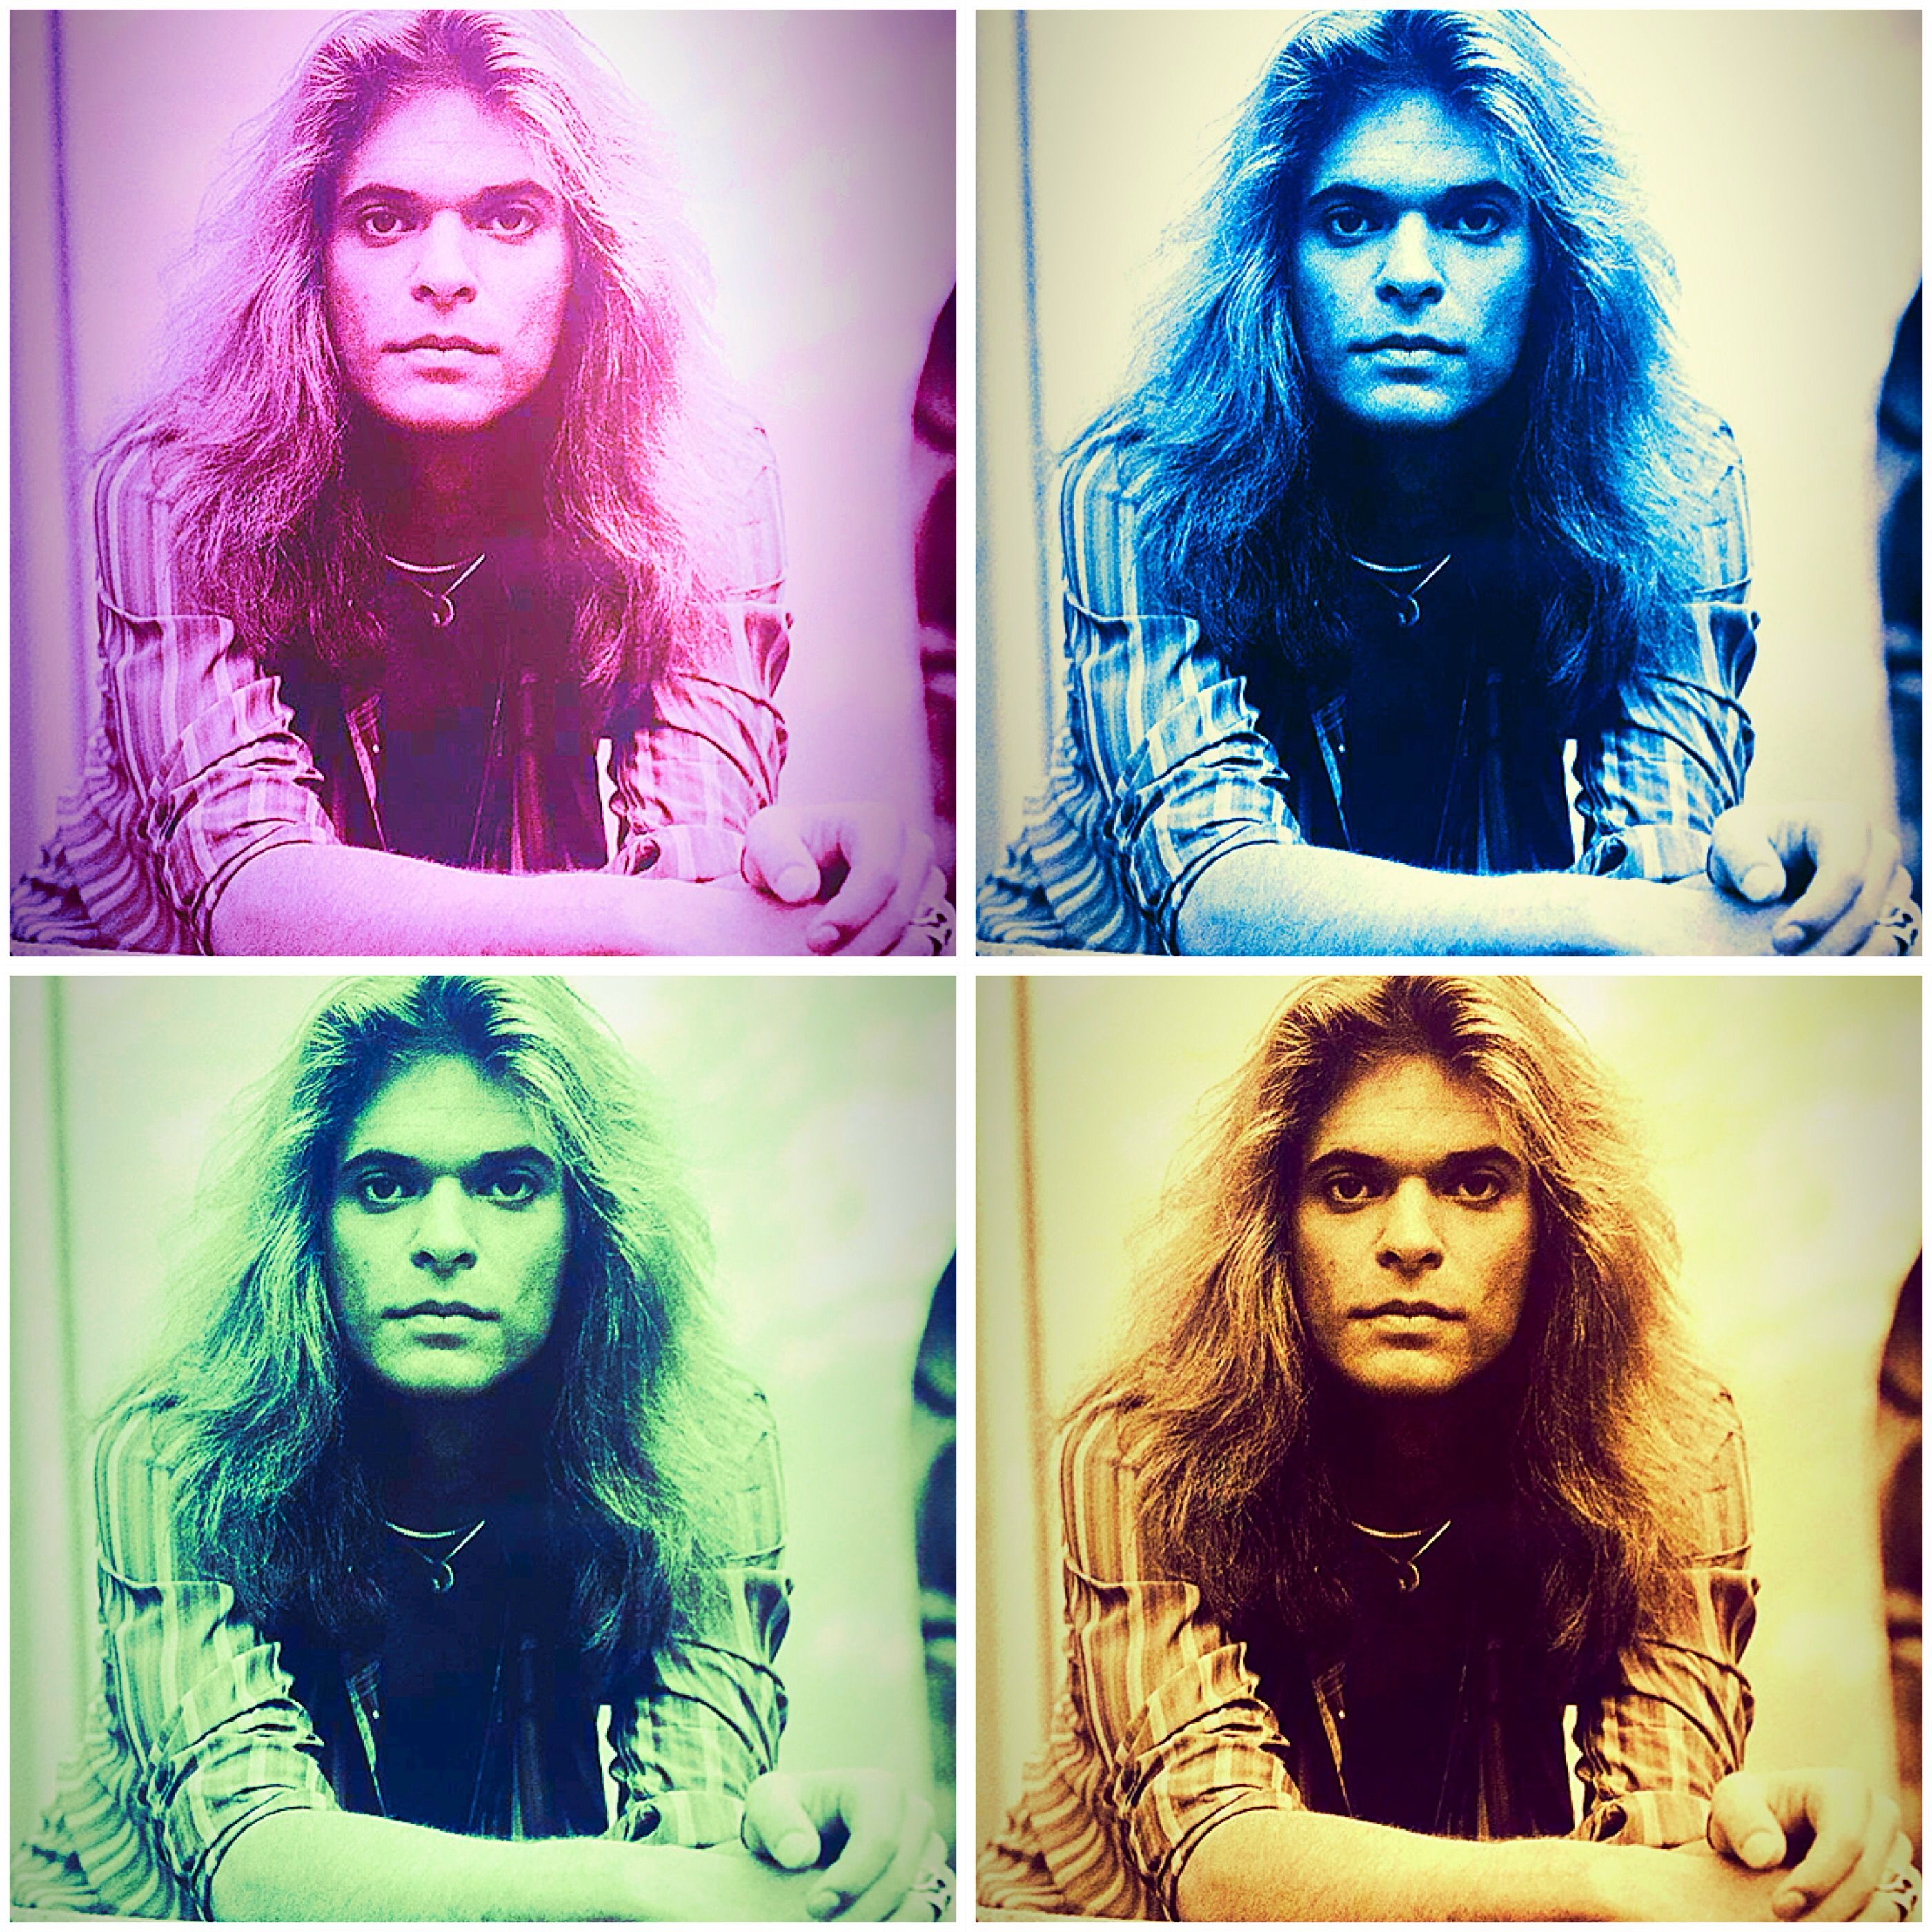 Diamond Dave David Lee Roth Van Halen Eddie Van Halen